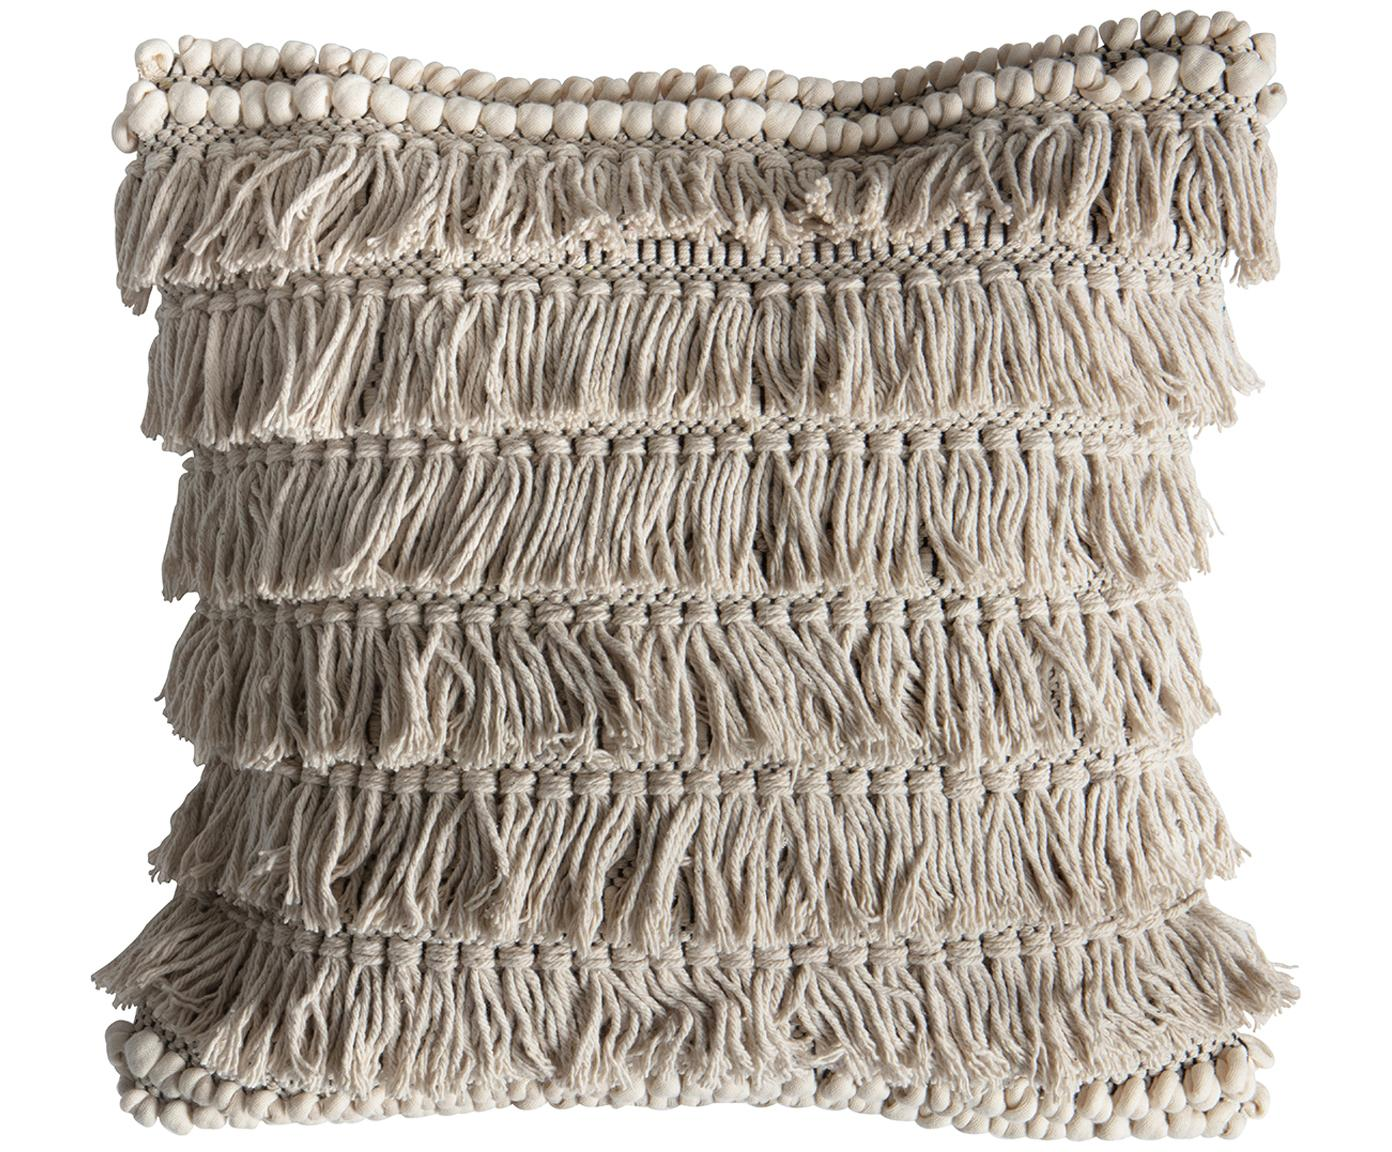 Cojín Tallara, estilo boho, con relleno, Funda: 100%algodón reciclado, Crema, An 45 x L 45 cm